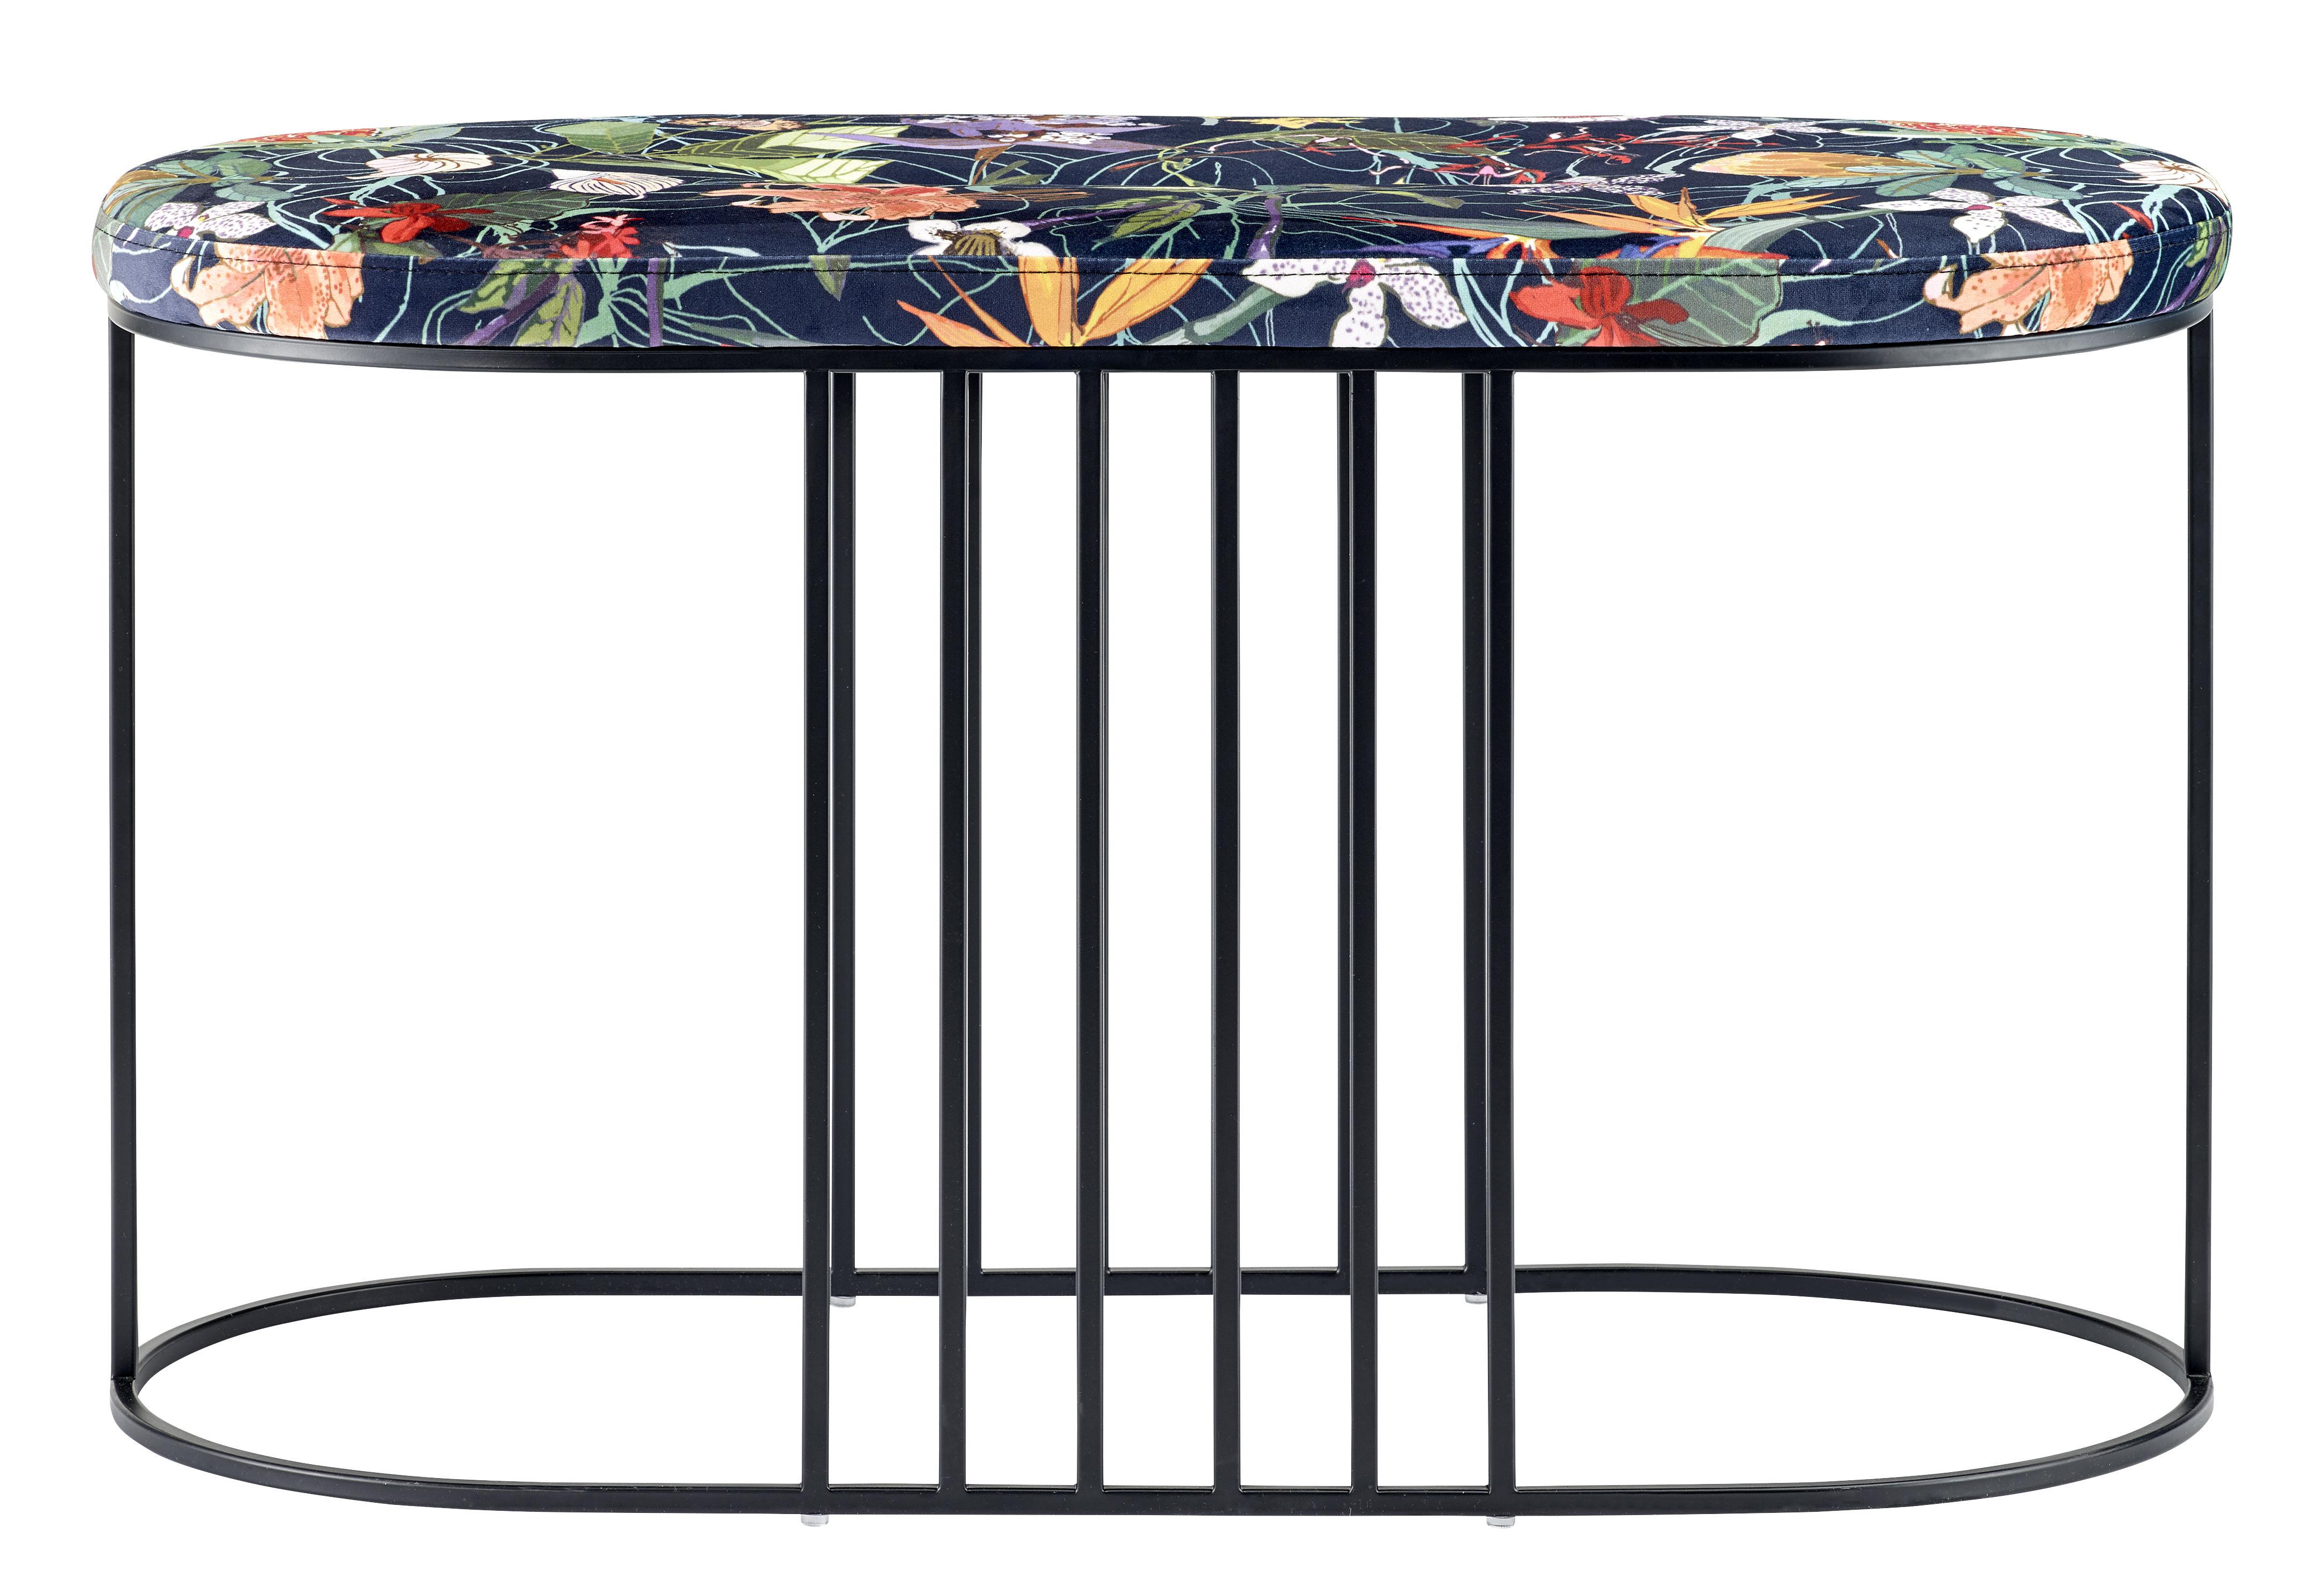 banc rembourr posea velours l 80 cm fleuri base bleu marine bolia. Black Bedroom Furniture Sets. Home Design Ideas